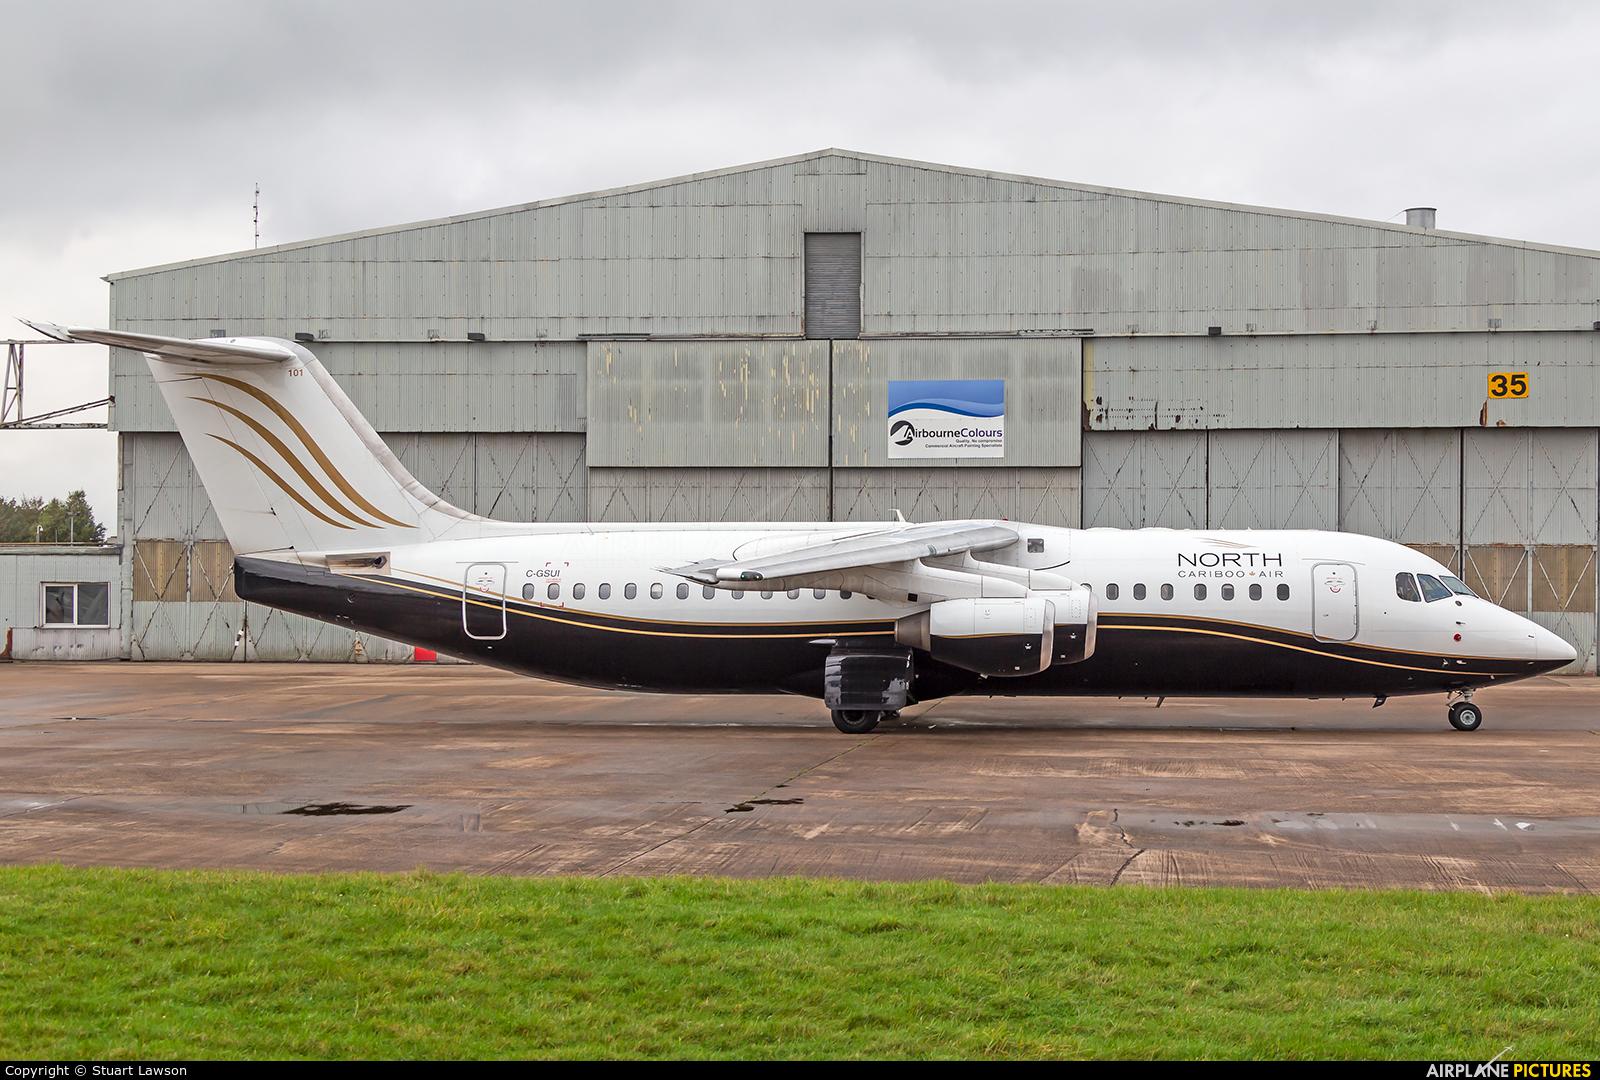 North Cariboo Air C-GSUI aircraft at East Midlands